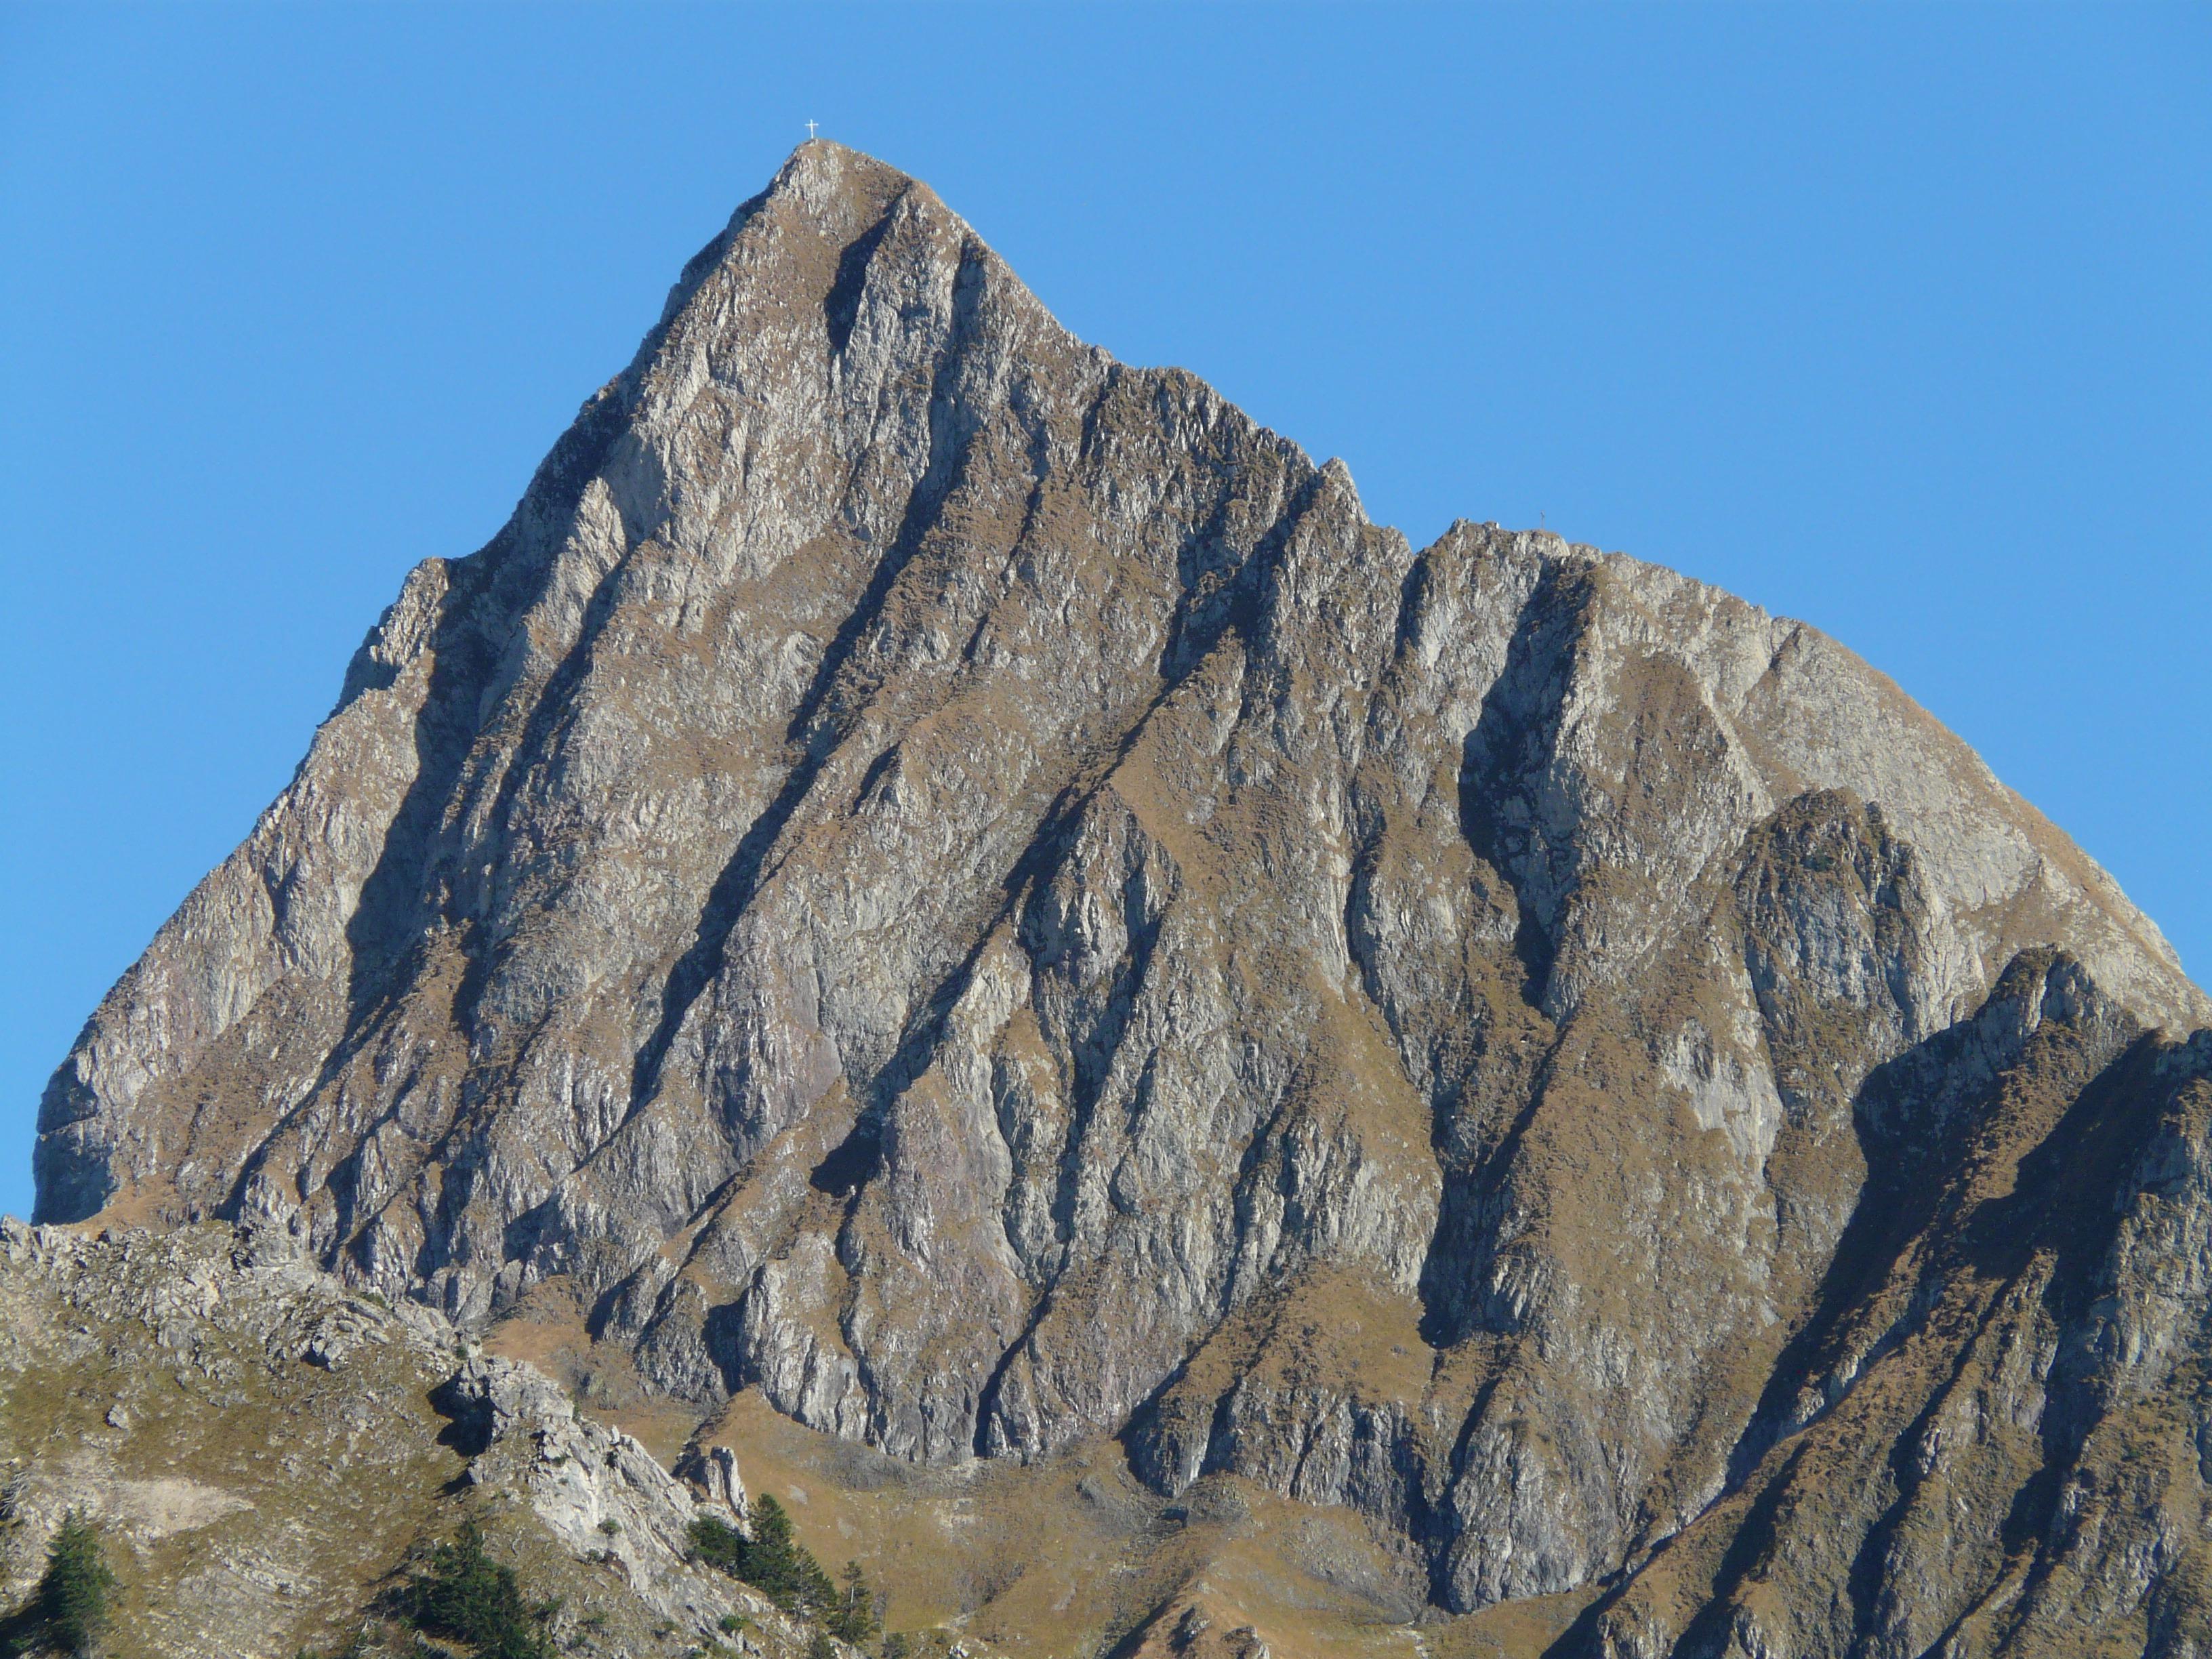 Mountain Peak during Daytime · Free Stock Photo